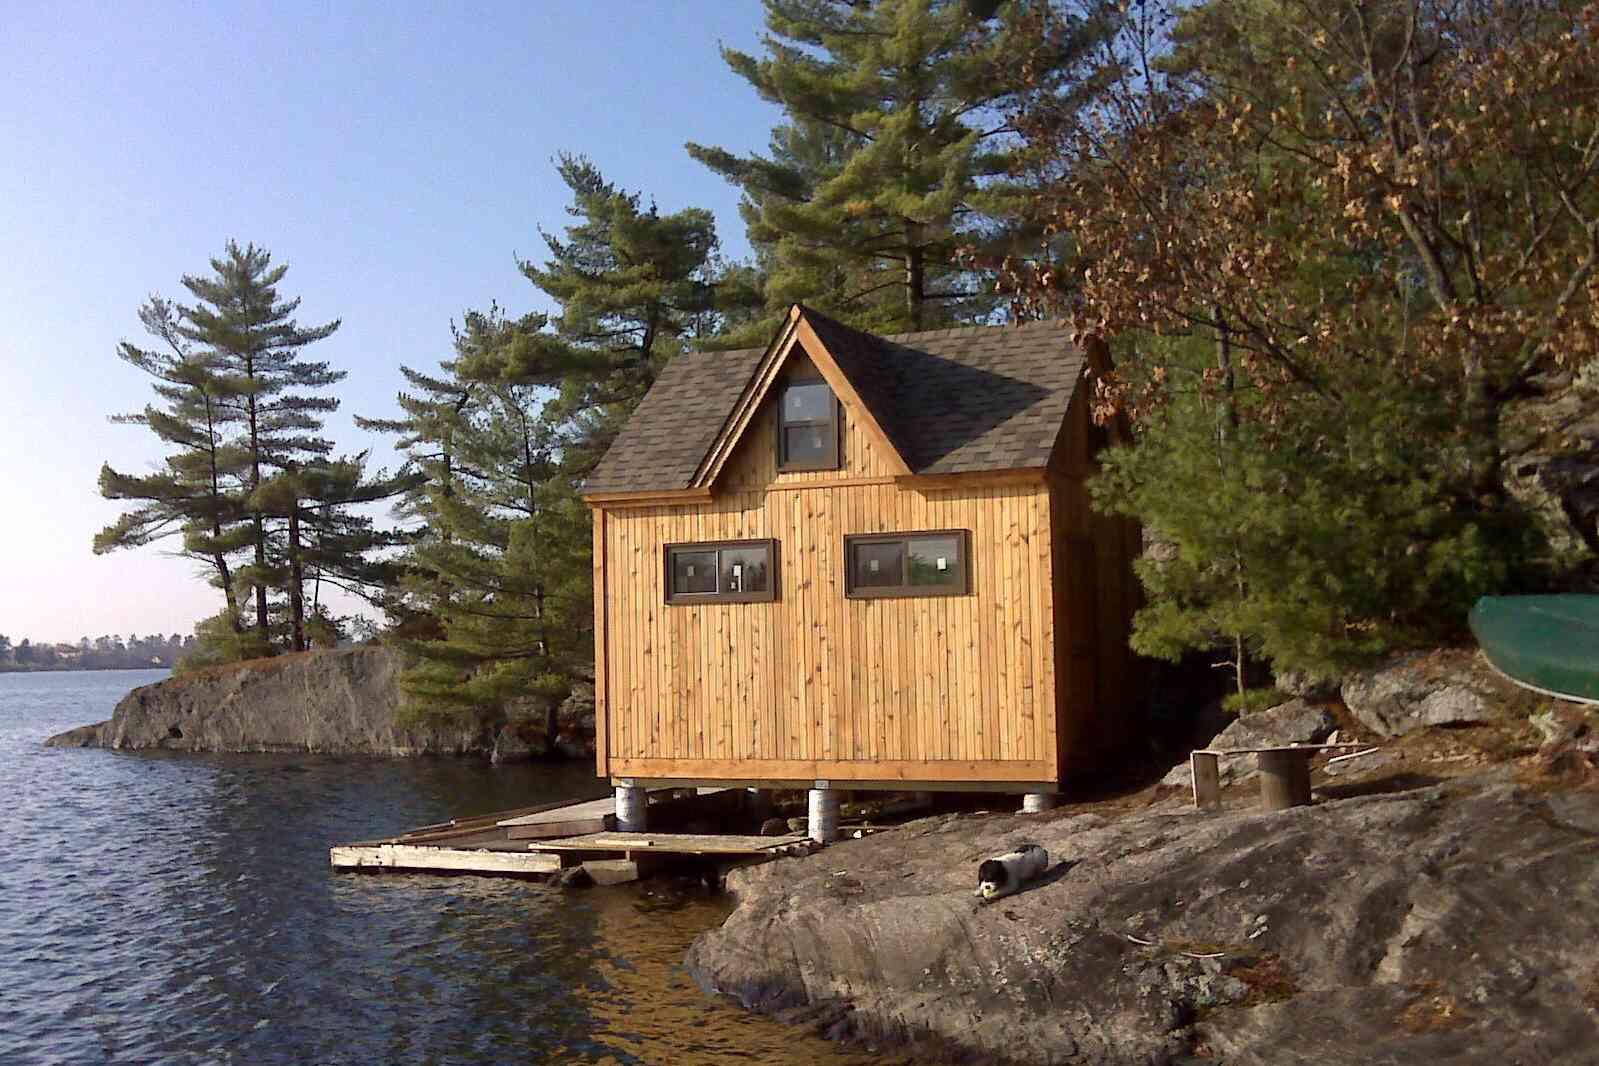 Summerwood Prefab cabin